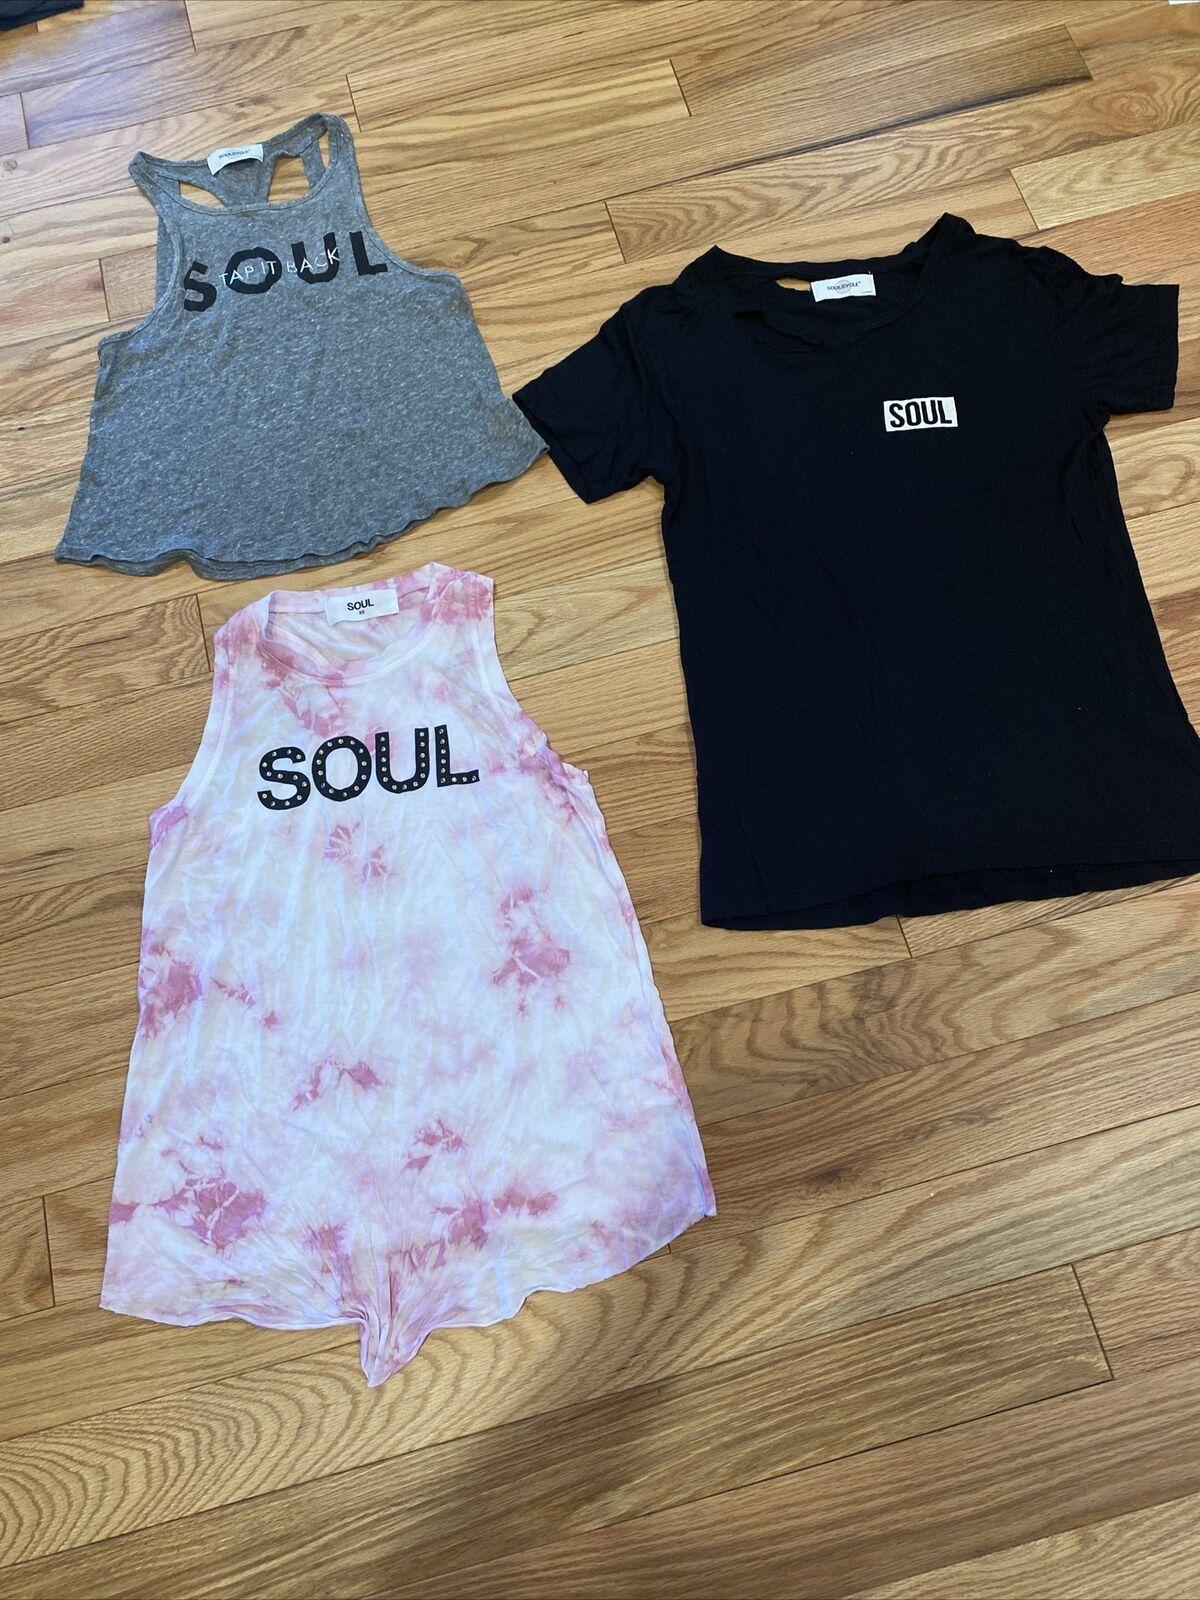 Soul Cycle X Small Soul Workout Tank T Shirt Sleeveless Lot Of 3 All NWOT